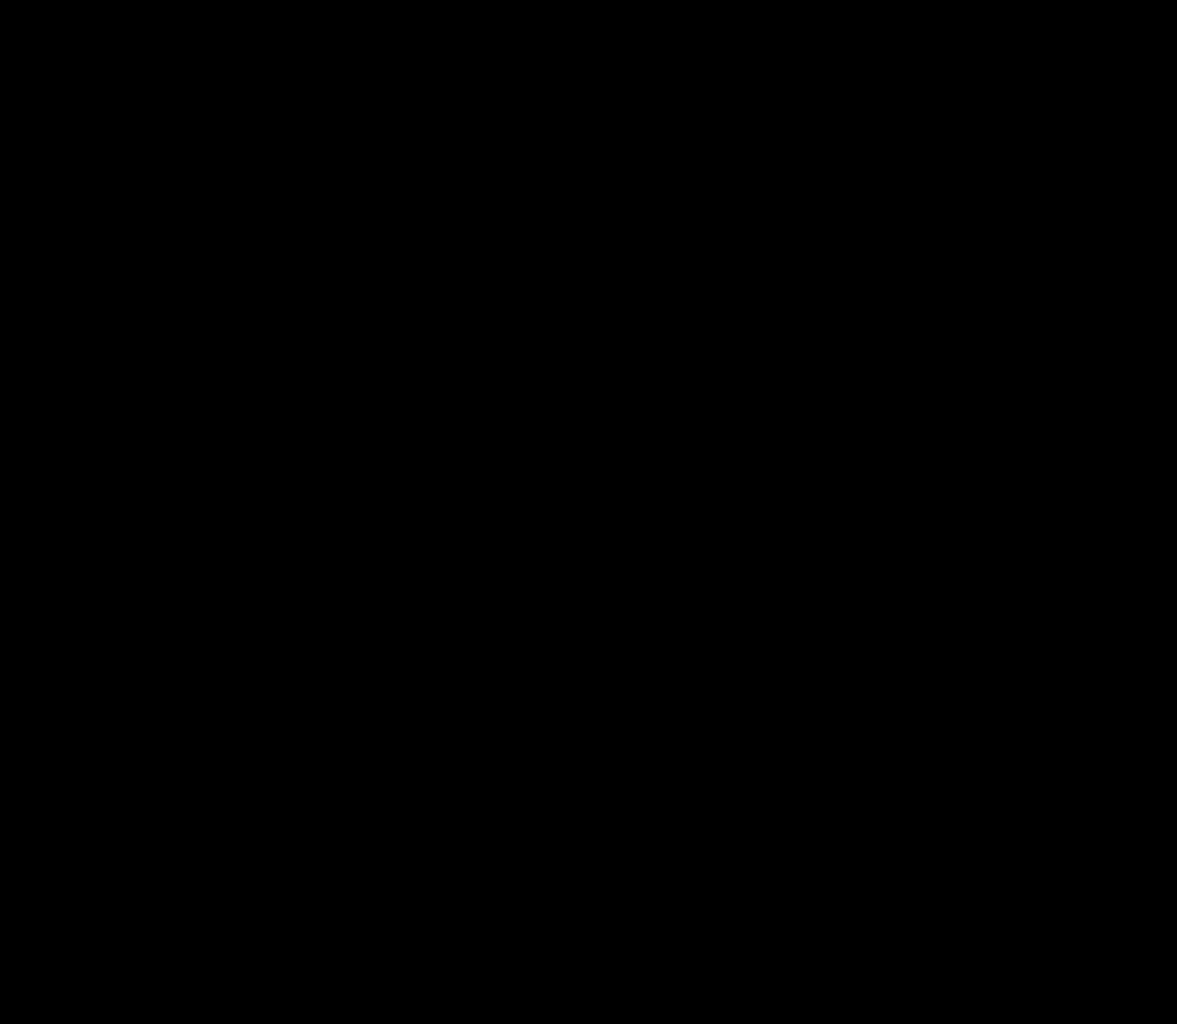 6b18ddef095262cd2c04dd7d1c052b53